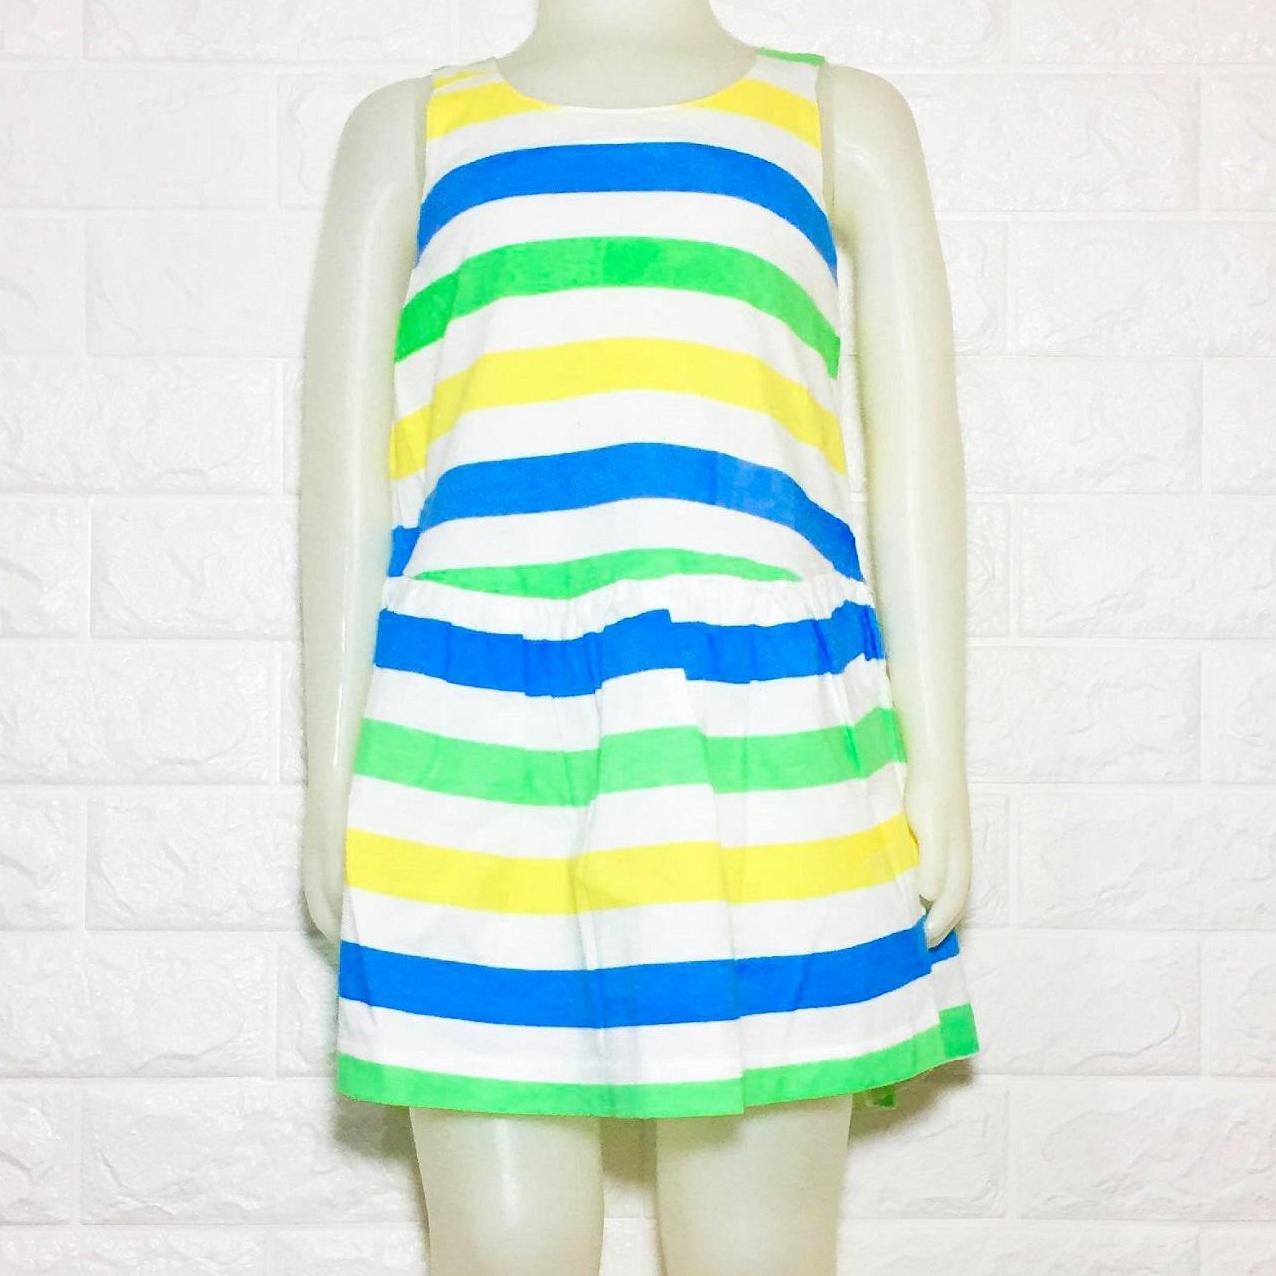 fa90ac76db Girls Dresses for sale - Dress for Girls online brands